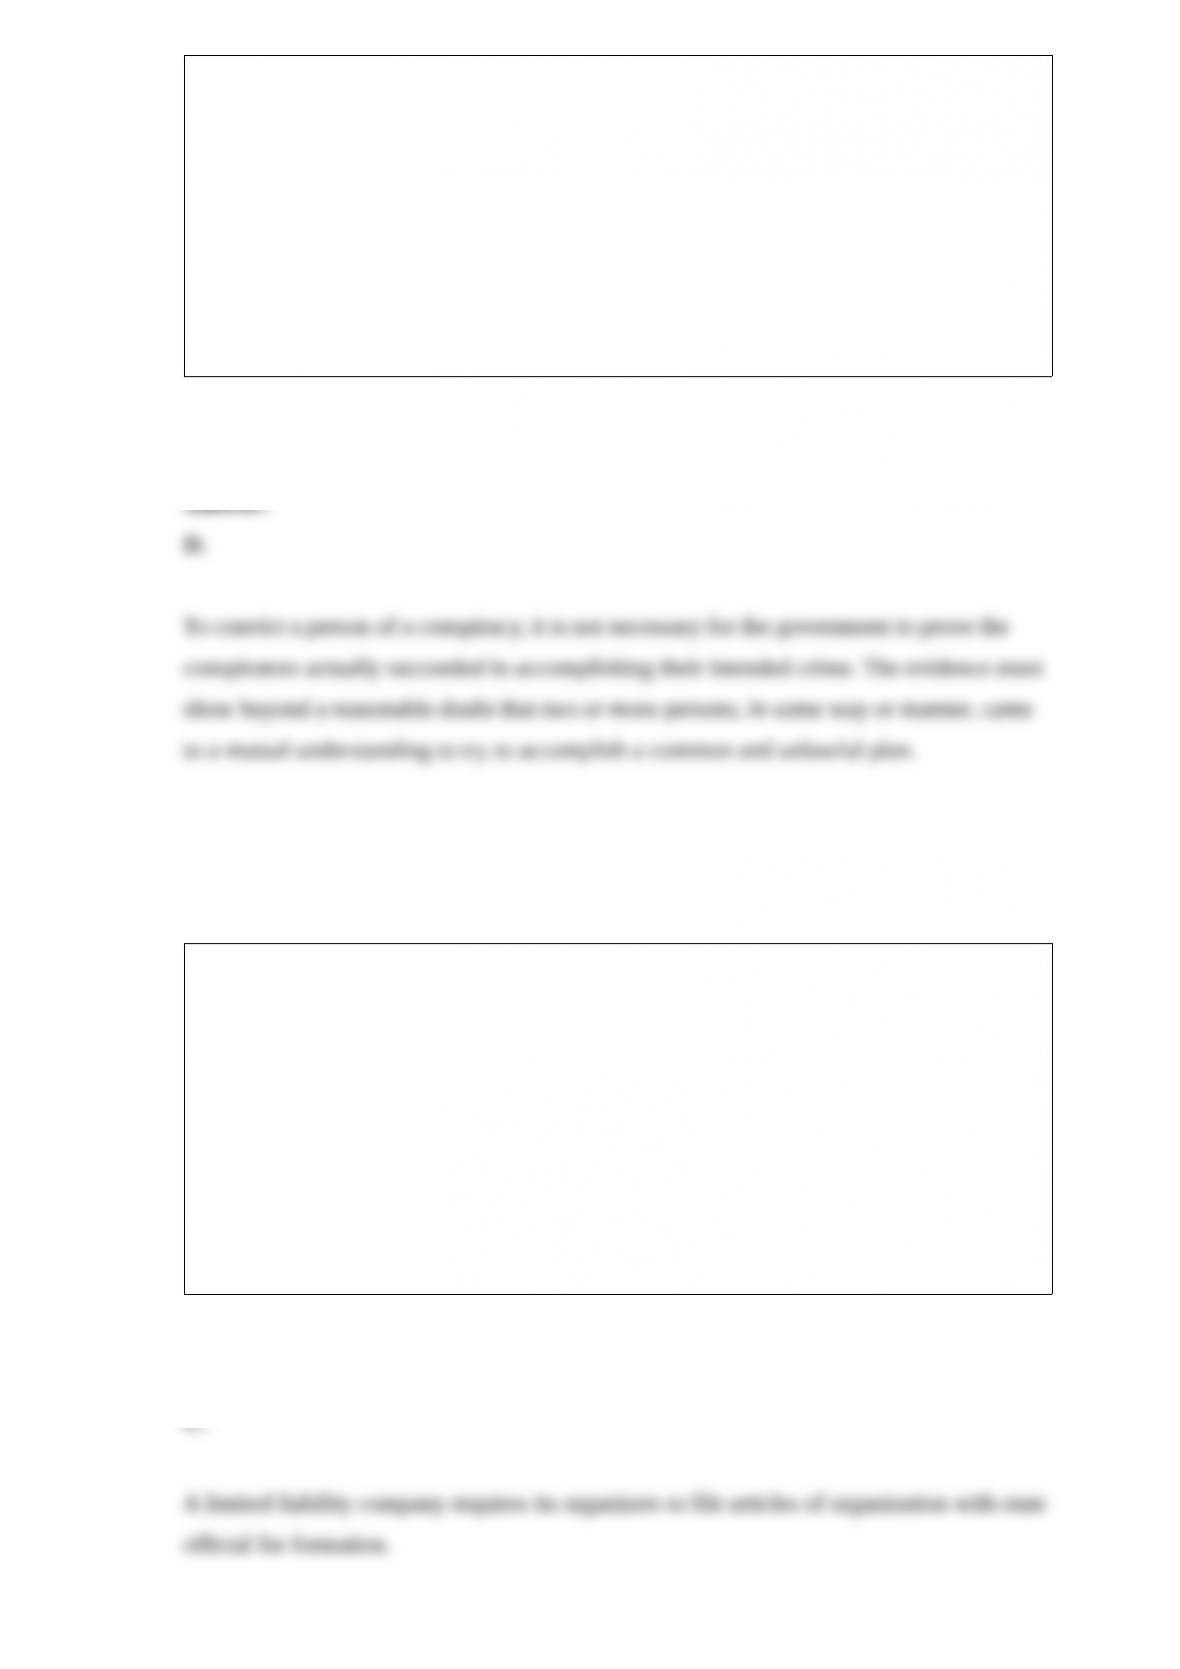 LWB 79627 | Get 24/7 Homework Help | Online Study Solutions